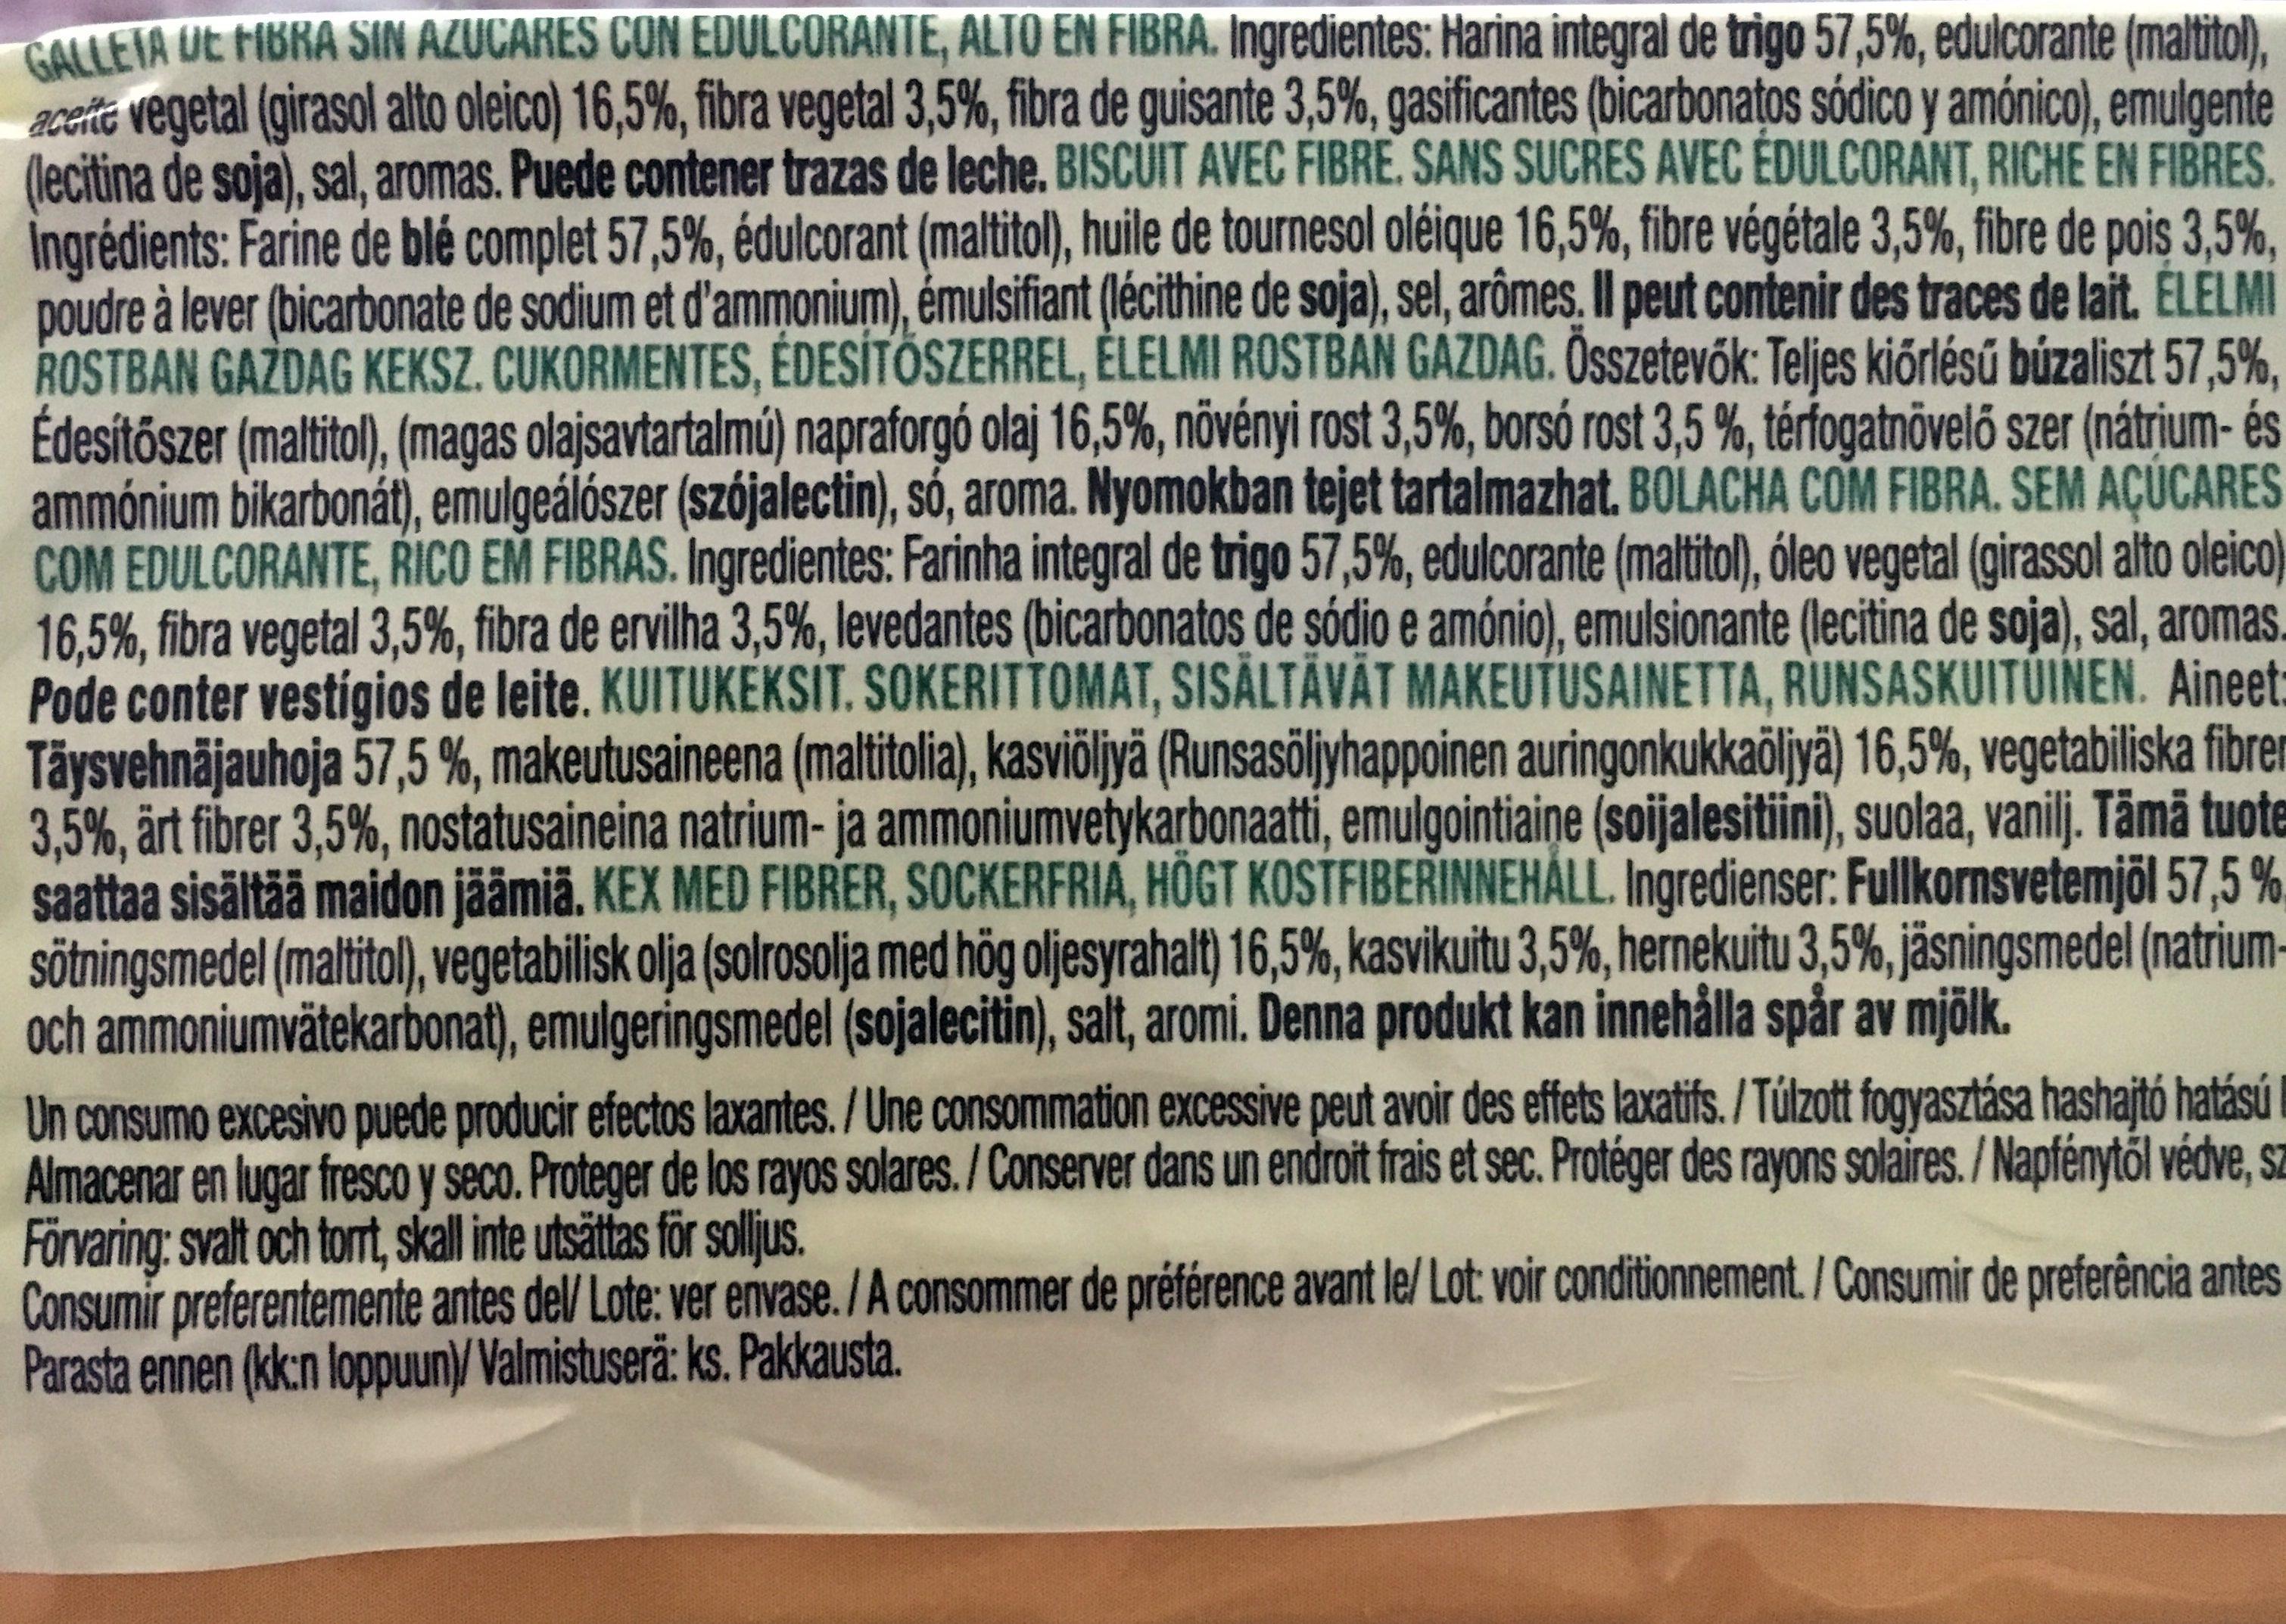 Diet Nature fibra integral sin azúcares - Ingredients